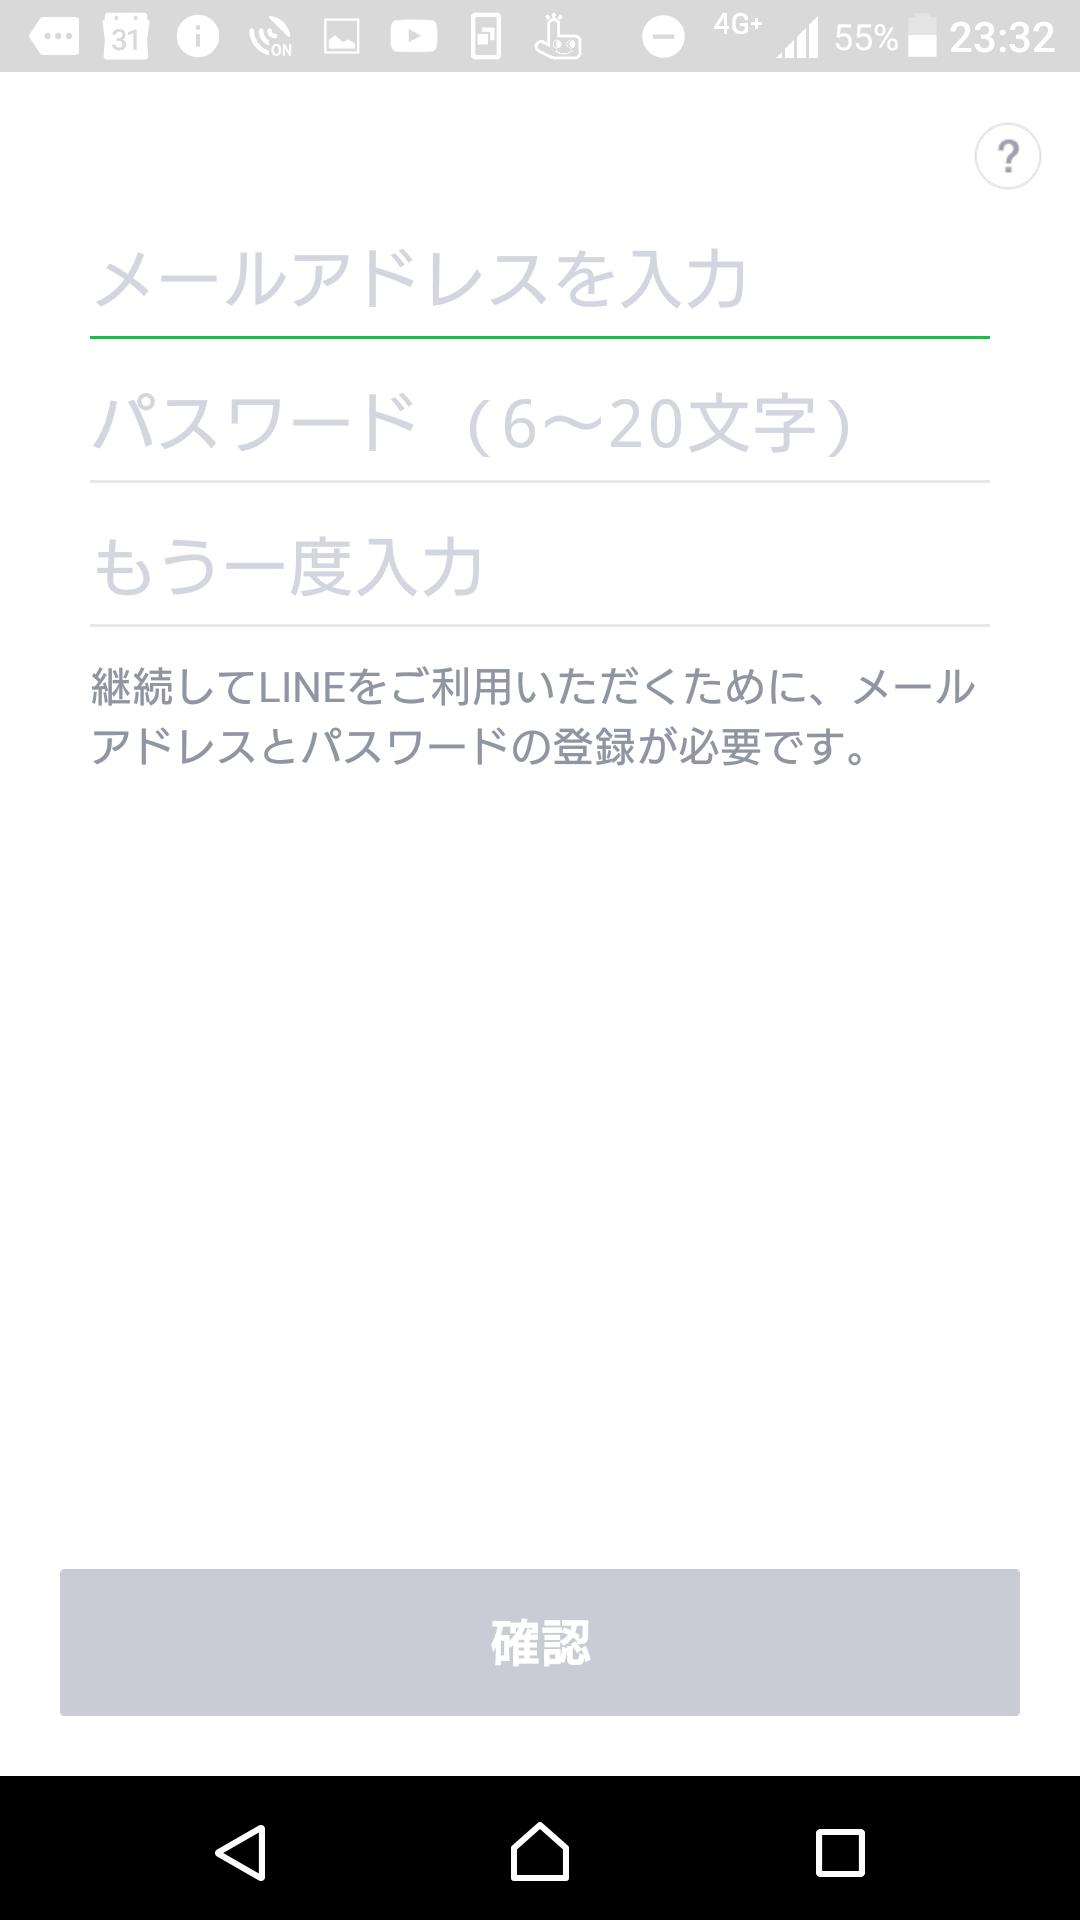 Screenshot_20180516-233257.png